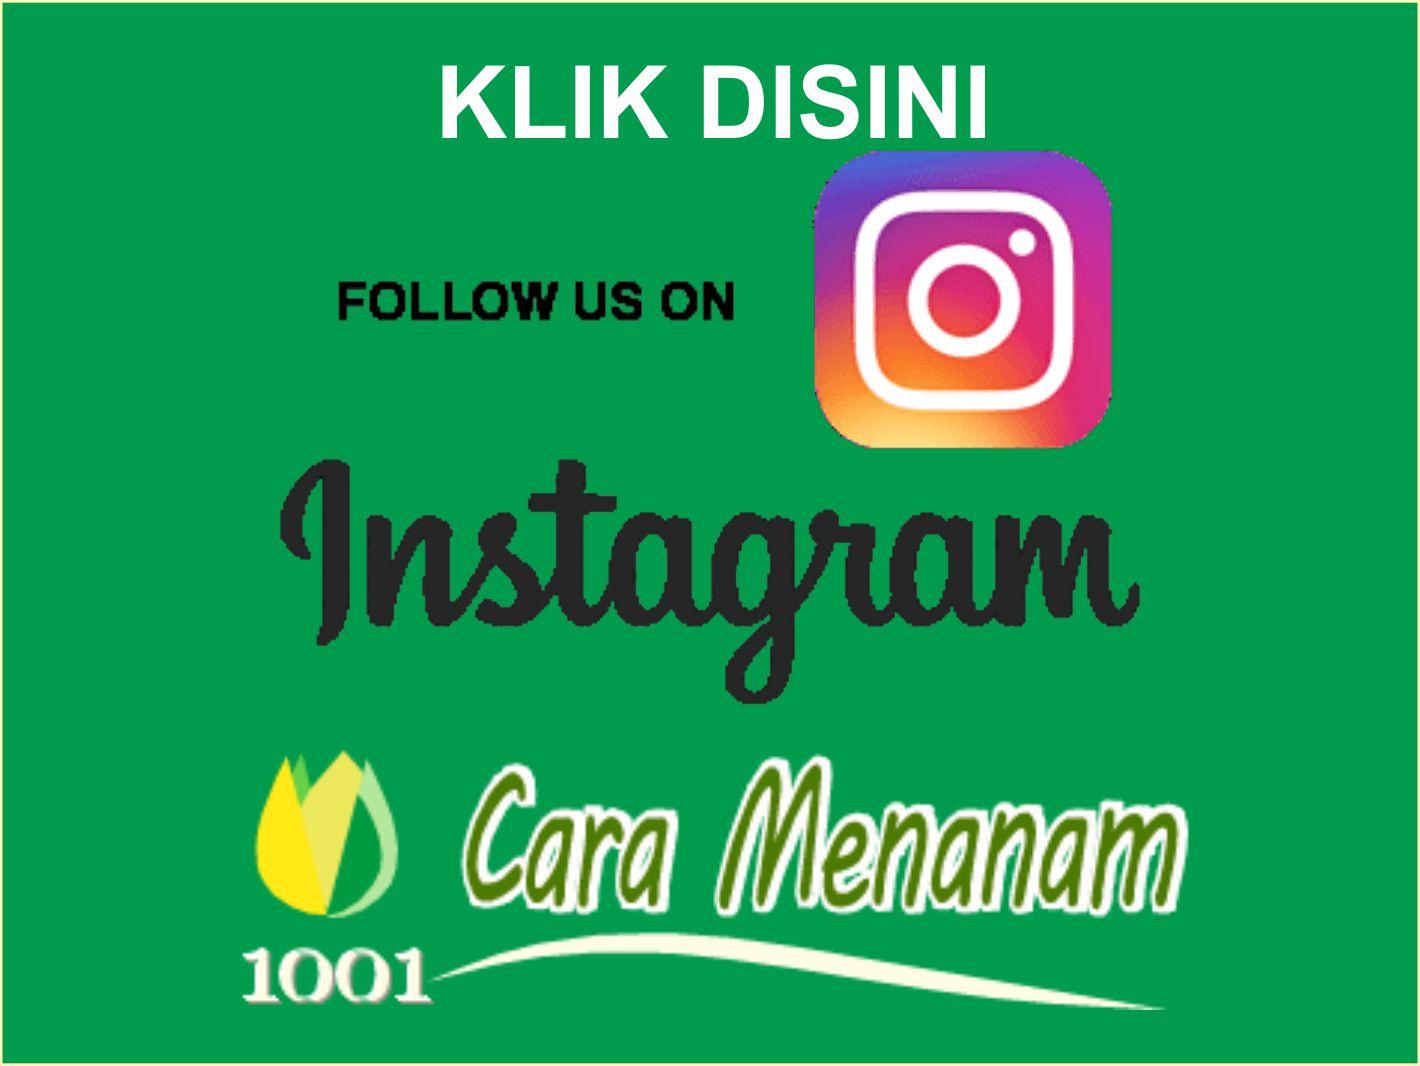 Instagram 1001 Cara Menanam